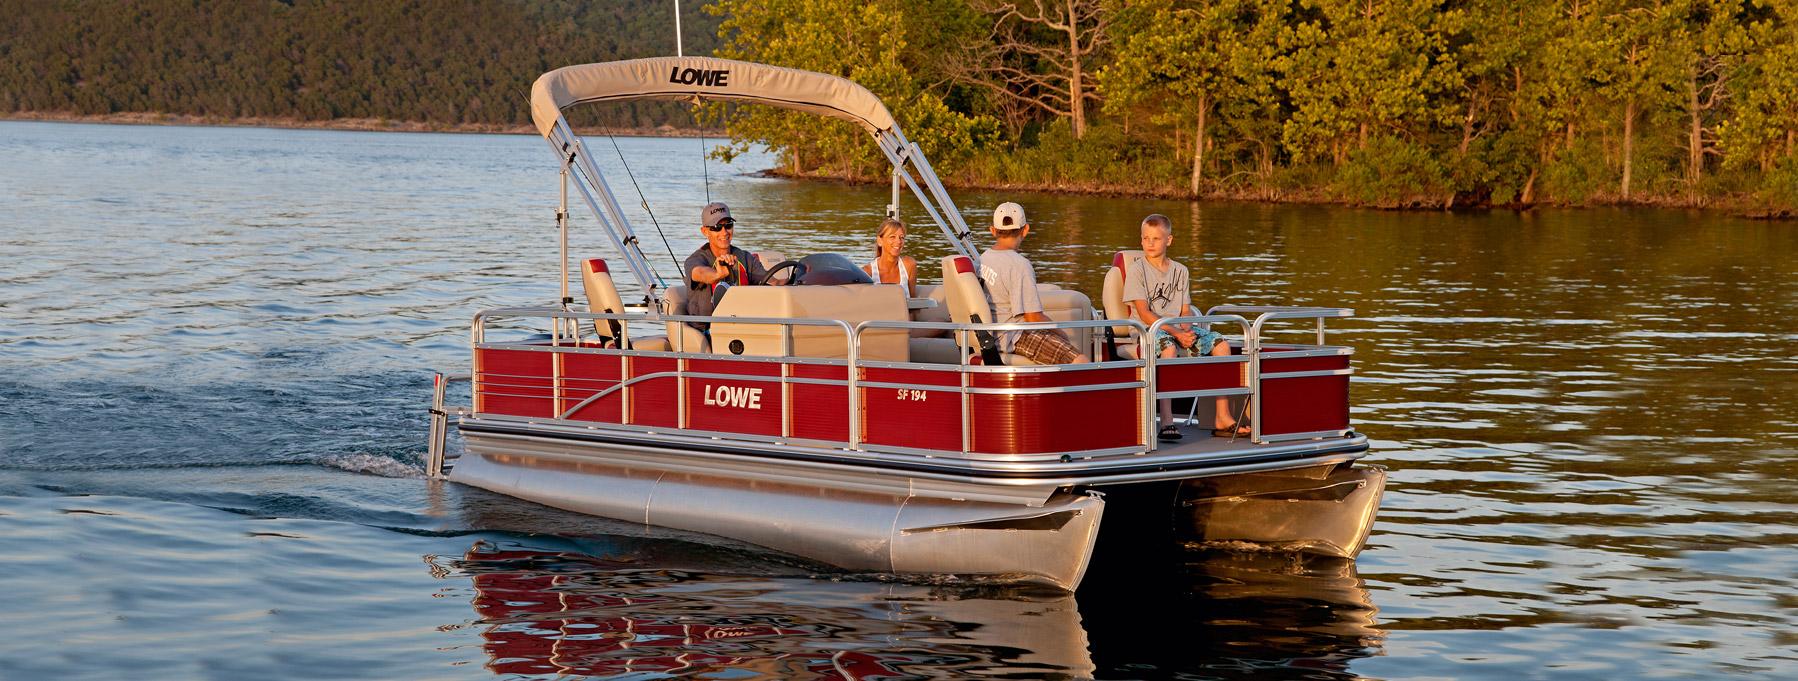 Lowe pontoons sf194 fishing pontoon top small sport for Best fishing pontoon boat